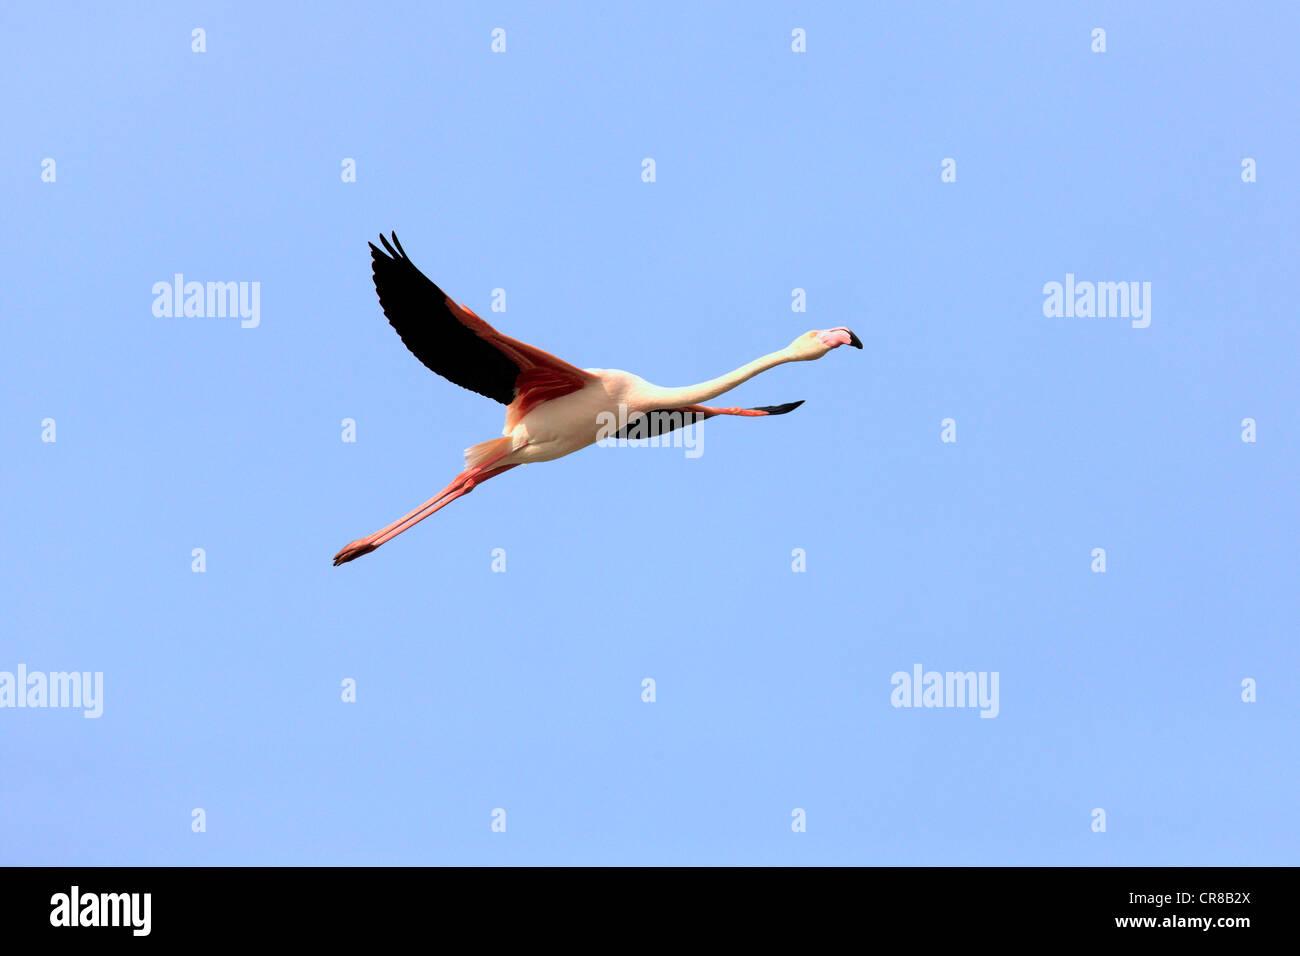 Aninimal Book: Greater Flamingo (Phoenicopterus ruber roseus), flying ...